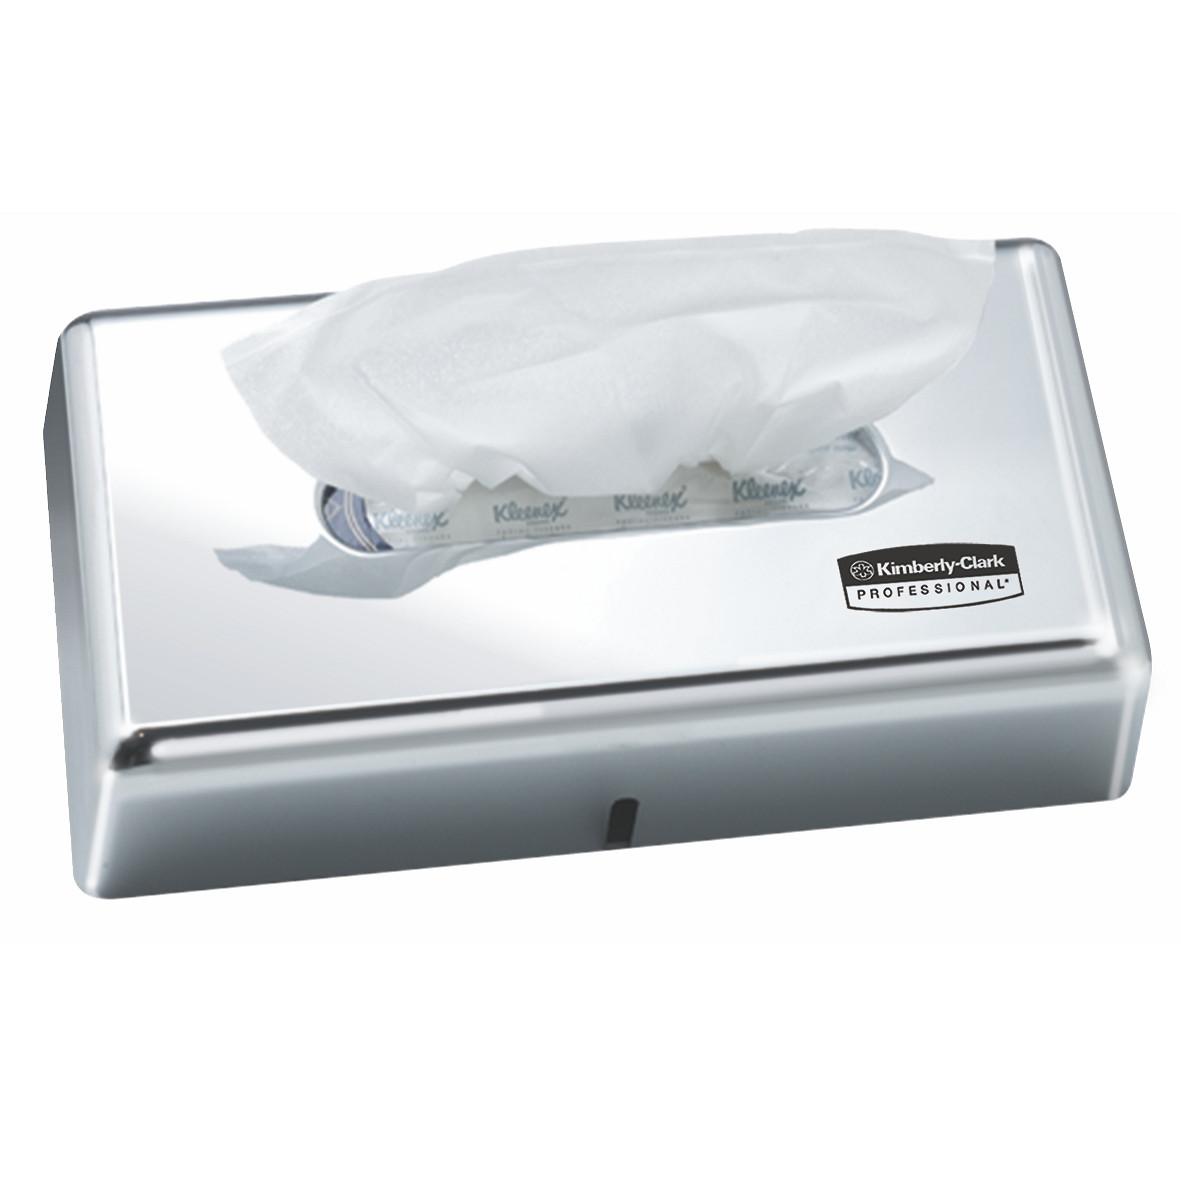 Kimberly-Clark Professional 7820 диспенсер салфеток для лица